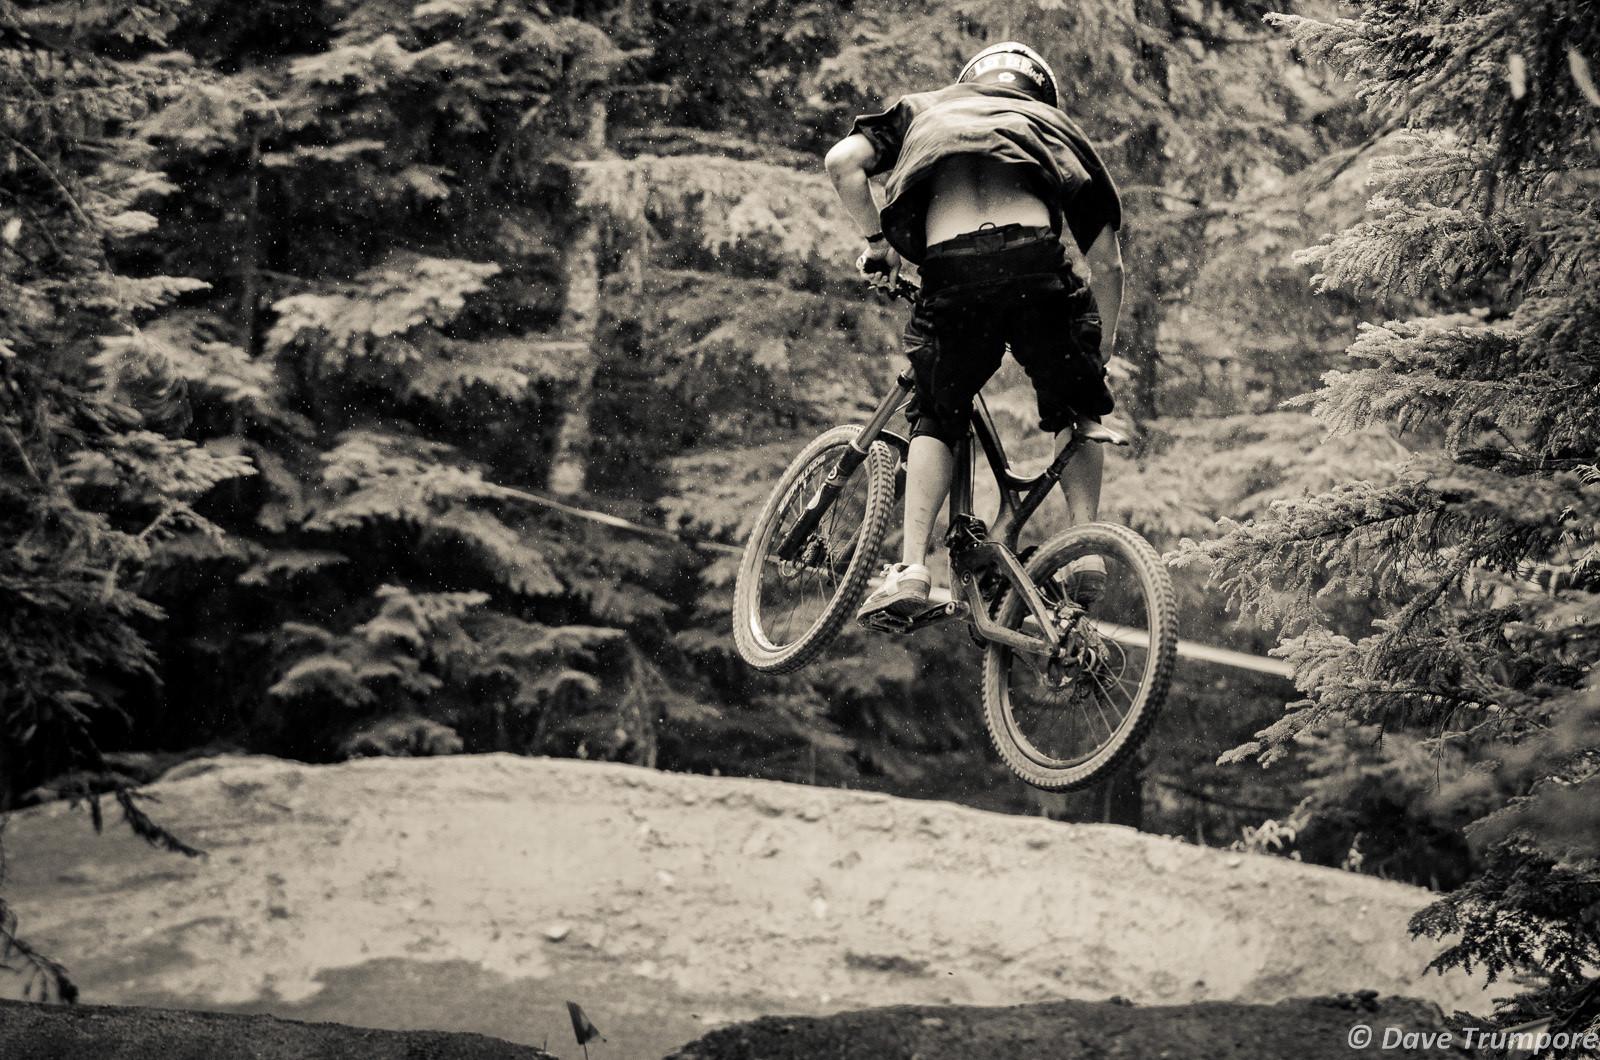 Let 'er Buck at Crankworx Air DH - Crankworx Whistler Air DH - Mountain Biking Pictures - Vital MTB